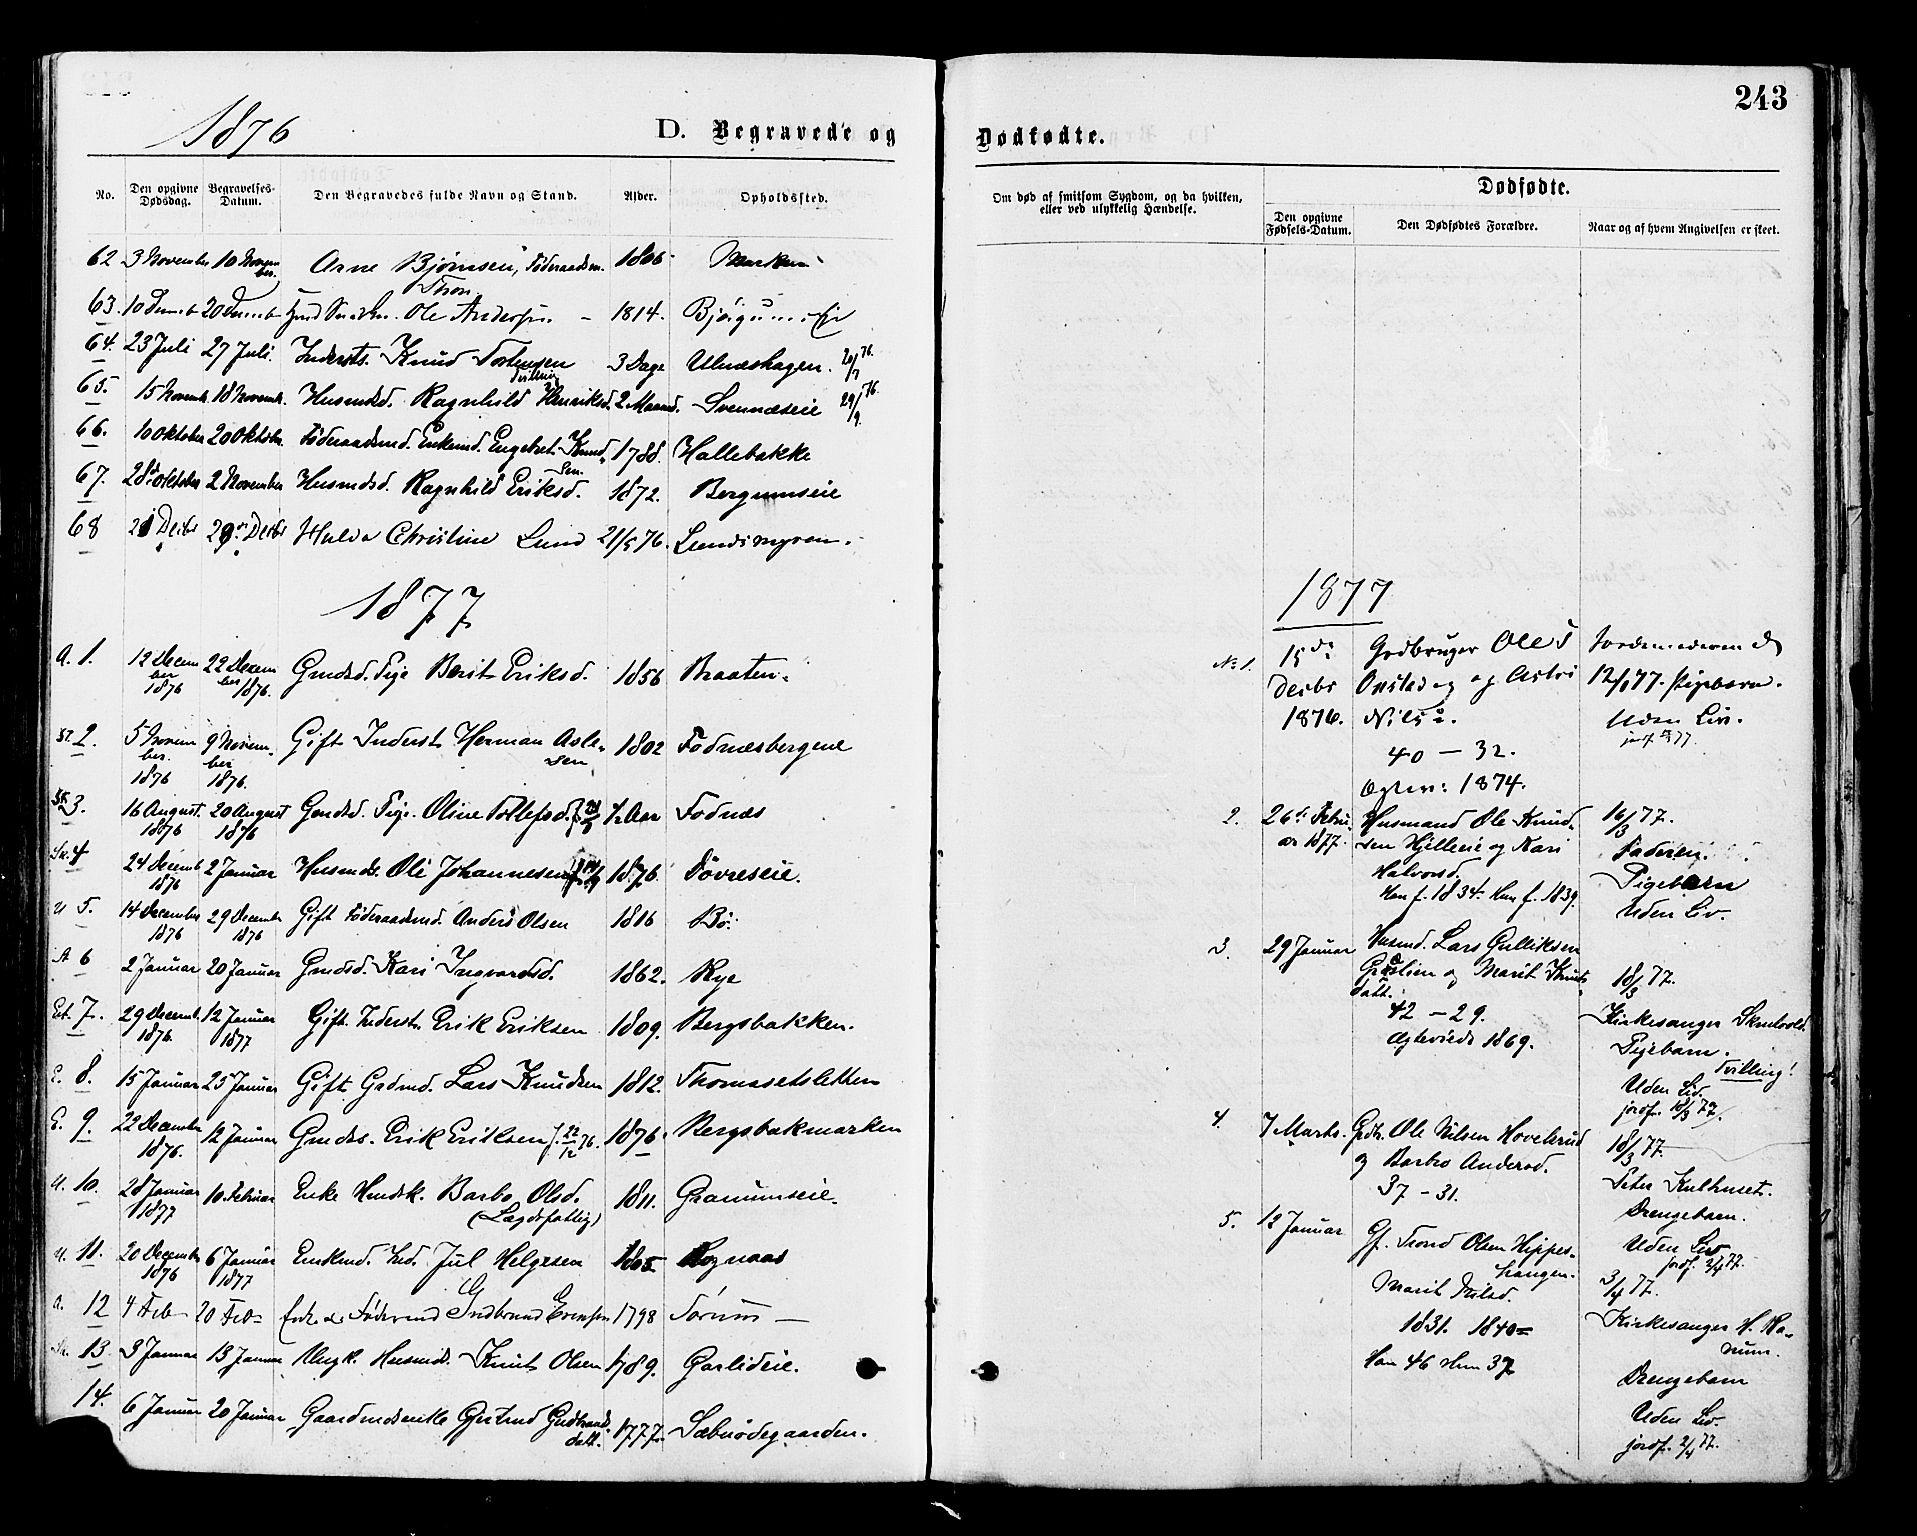 SAH, Nord-Aurdal prestekontor, Ministerialbok nr. 9, 1876-1882, s. 243